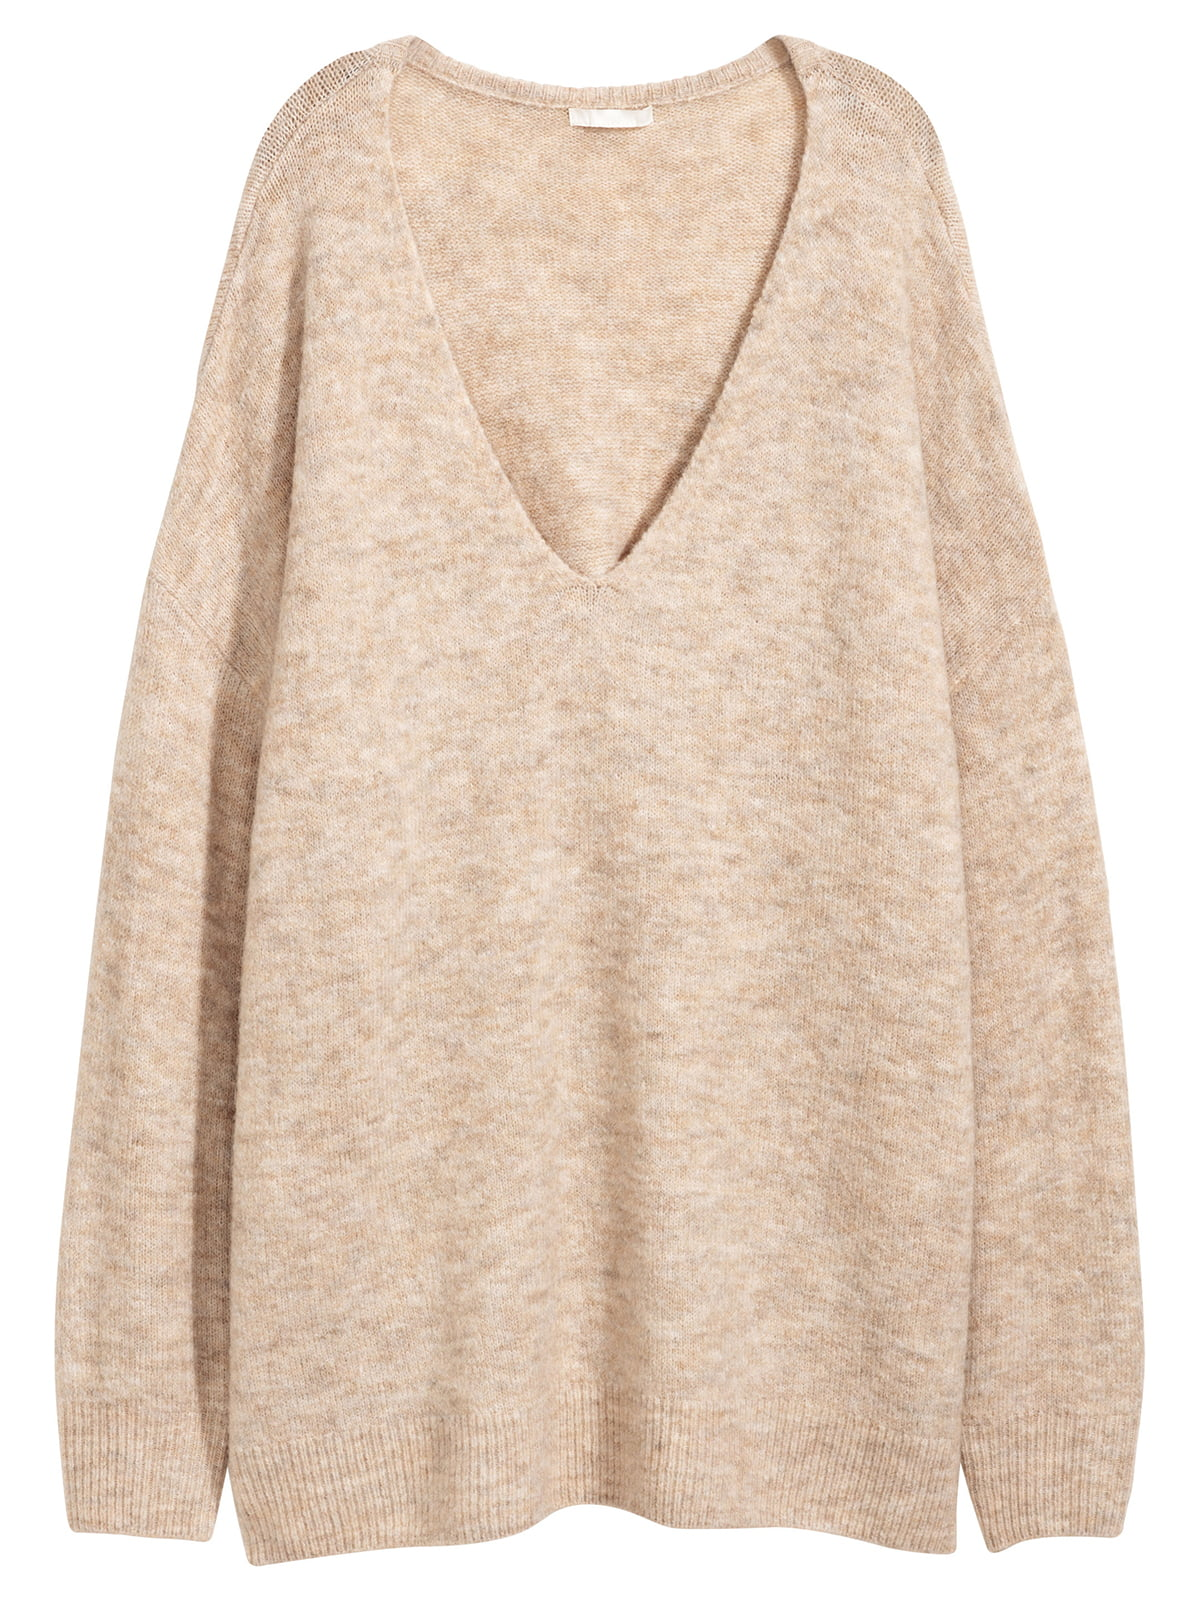 Пуловер светло-бежевый | 5244963